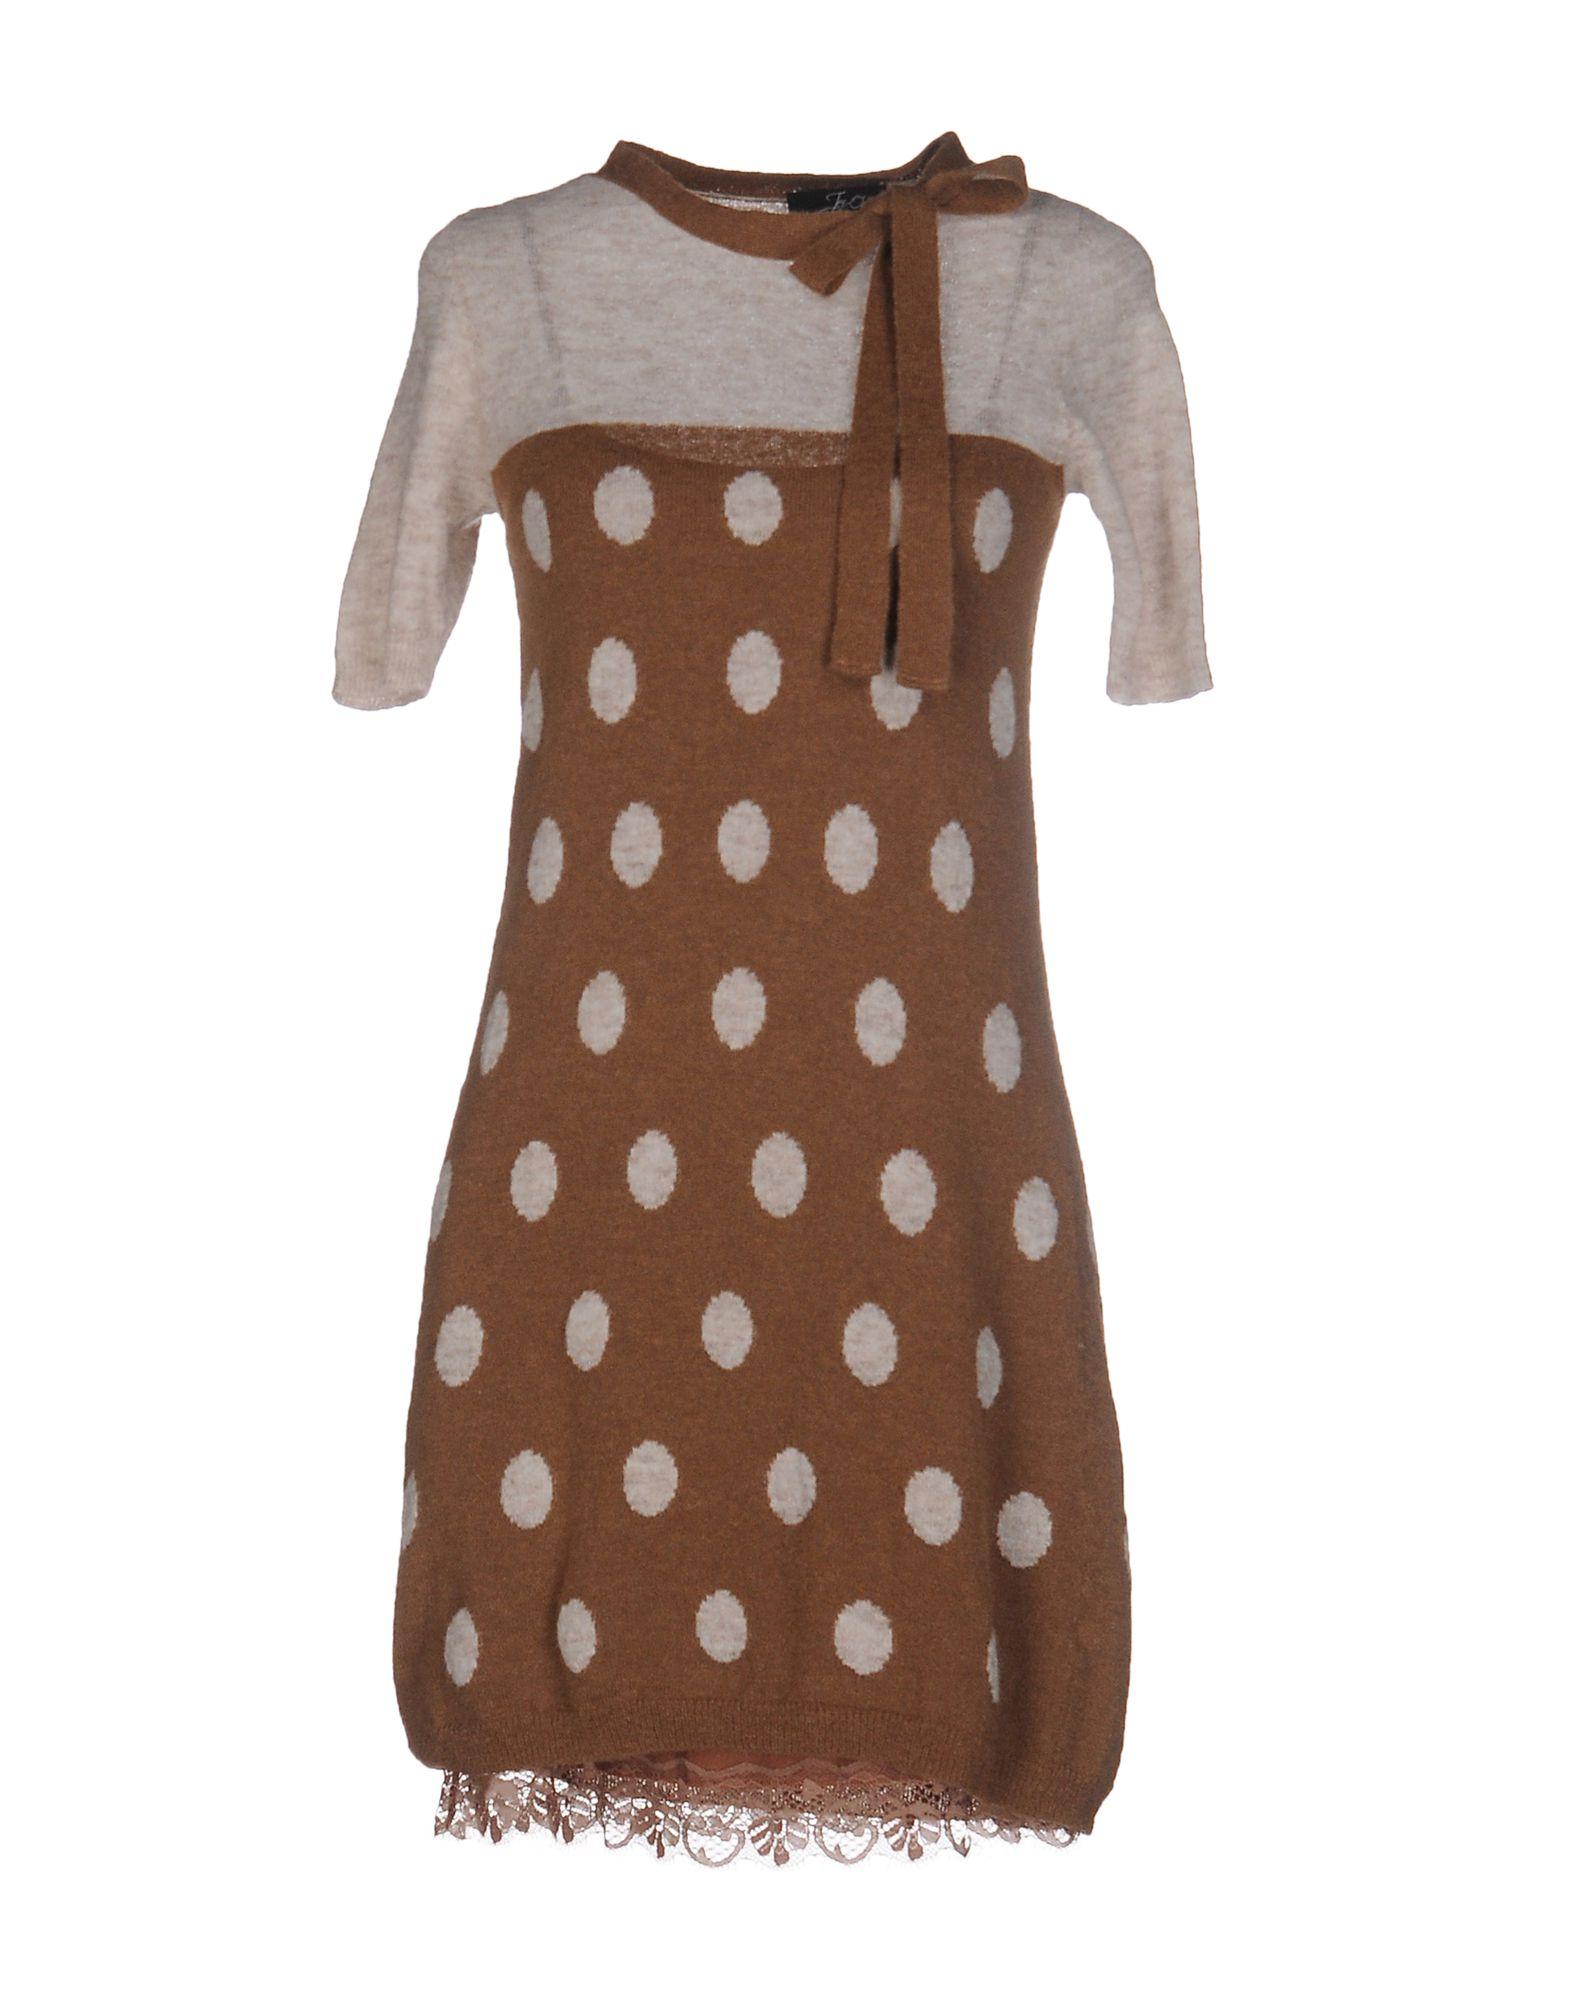 JEI O' Короткое платье shure mx153c o tqg